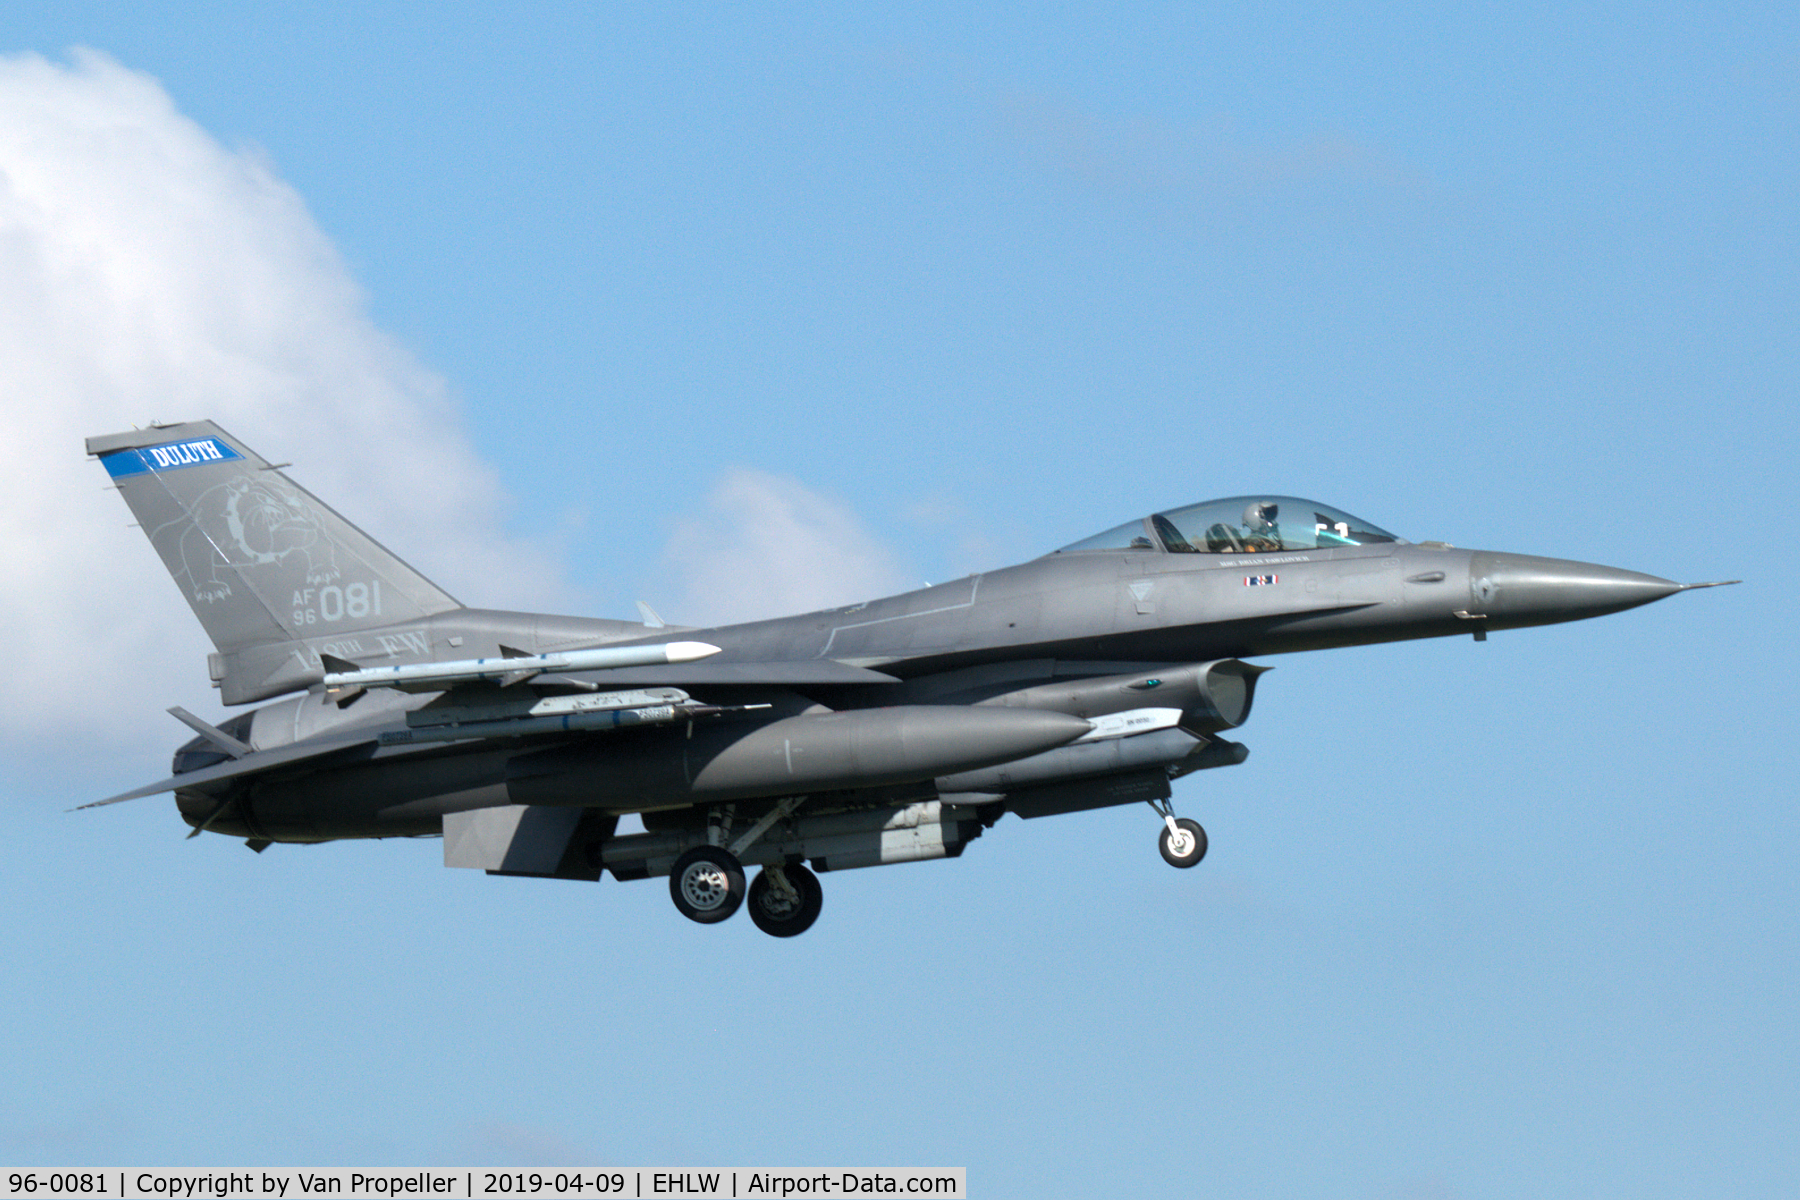 96-0081, 1996 General Dynamics F-16CM Fighting Falcon C/N CC-203, Minnesota ANG F-16C landing at Leeuwarden air base, the Netherlands, Frisian Flag 2019